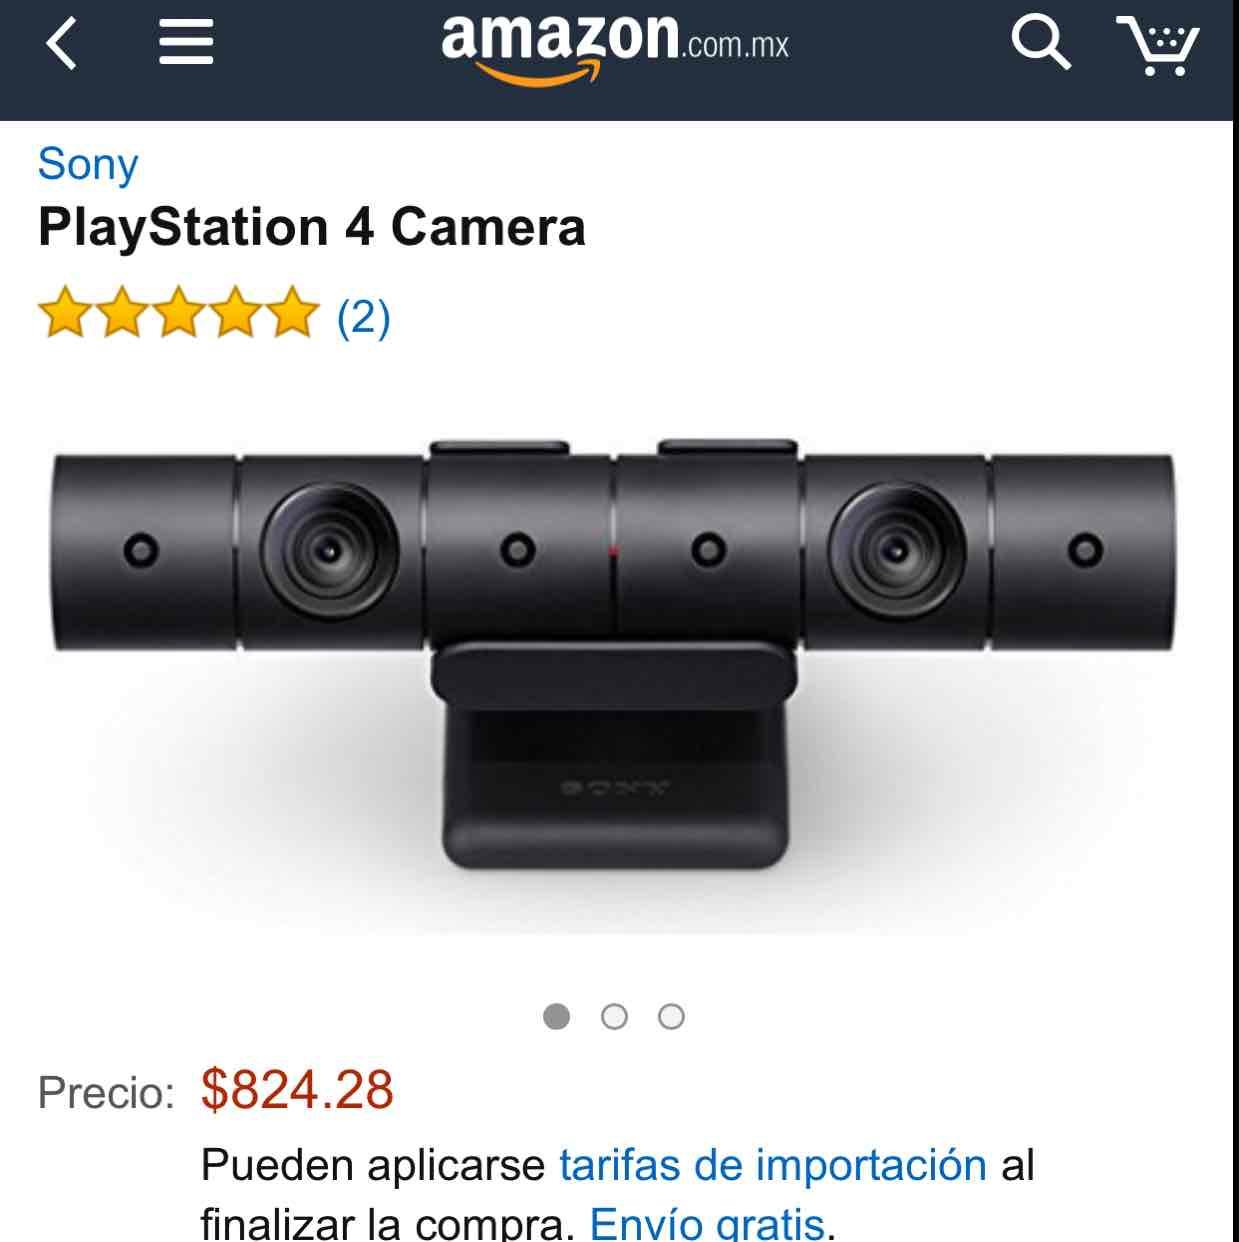 Amazon: PS4 Camera a 824